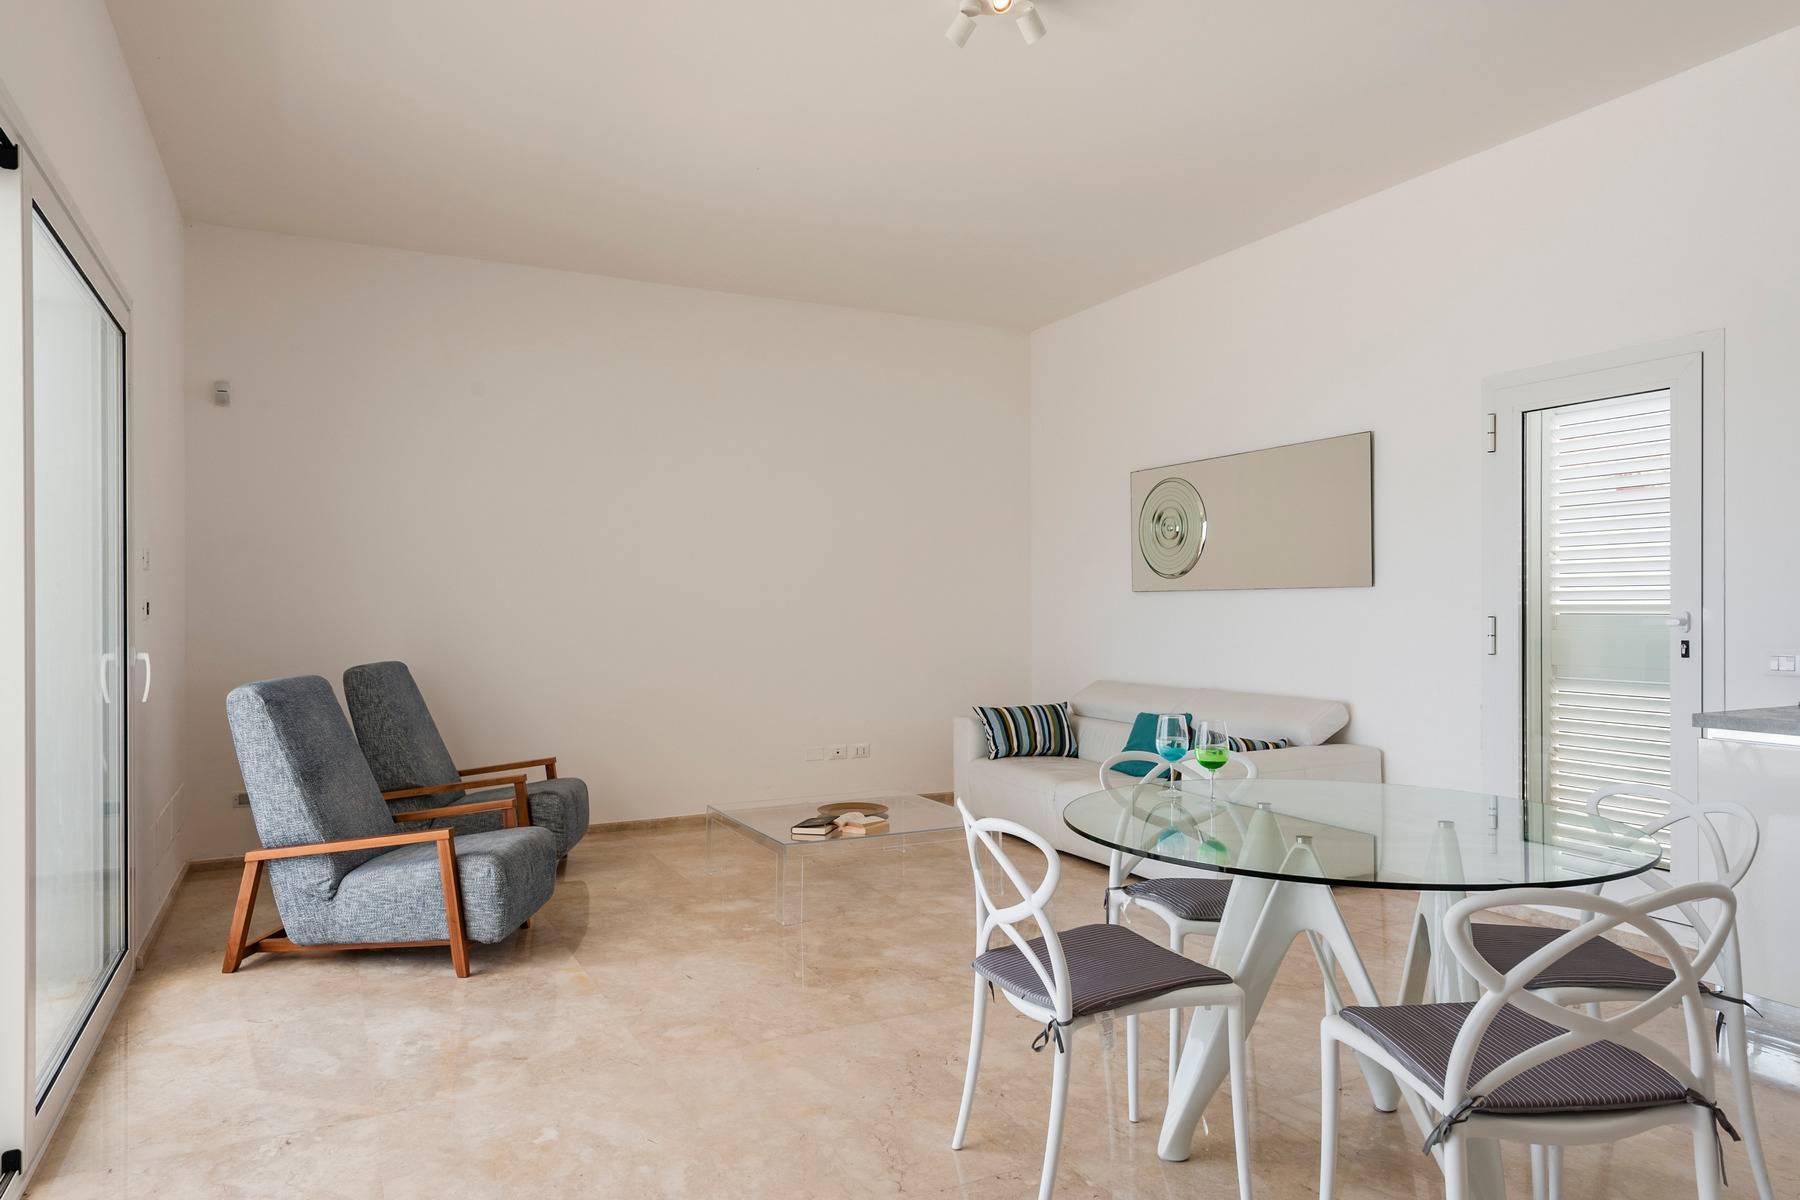 Casa indipendente in Vendita a Avola: 5 locali, 131 mq - Foto 14